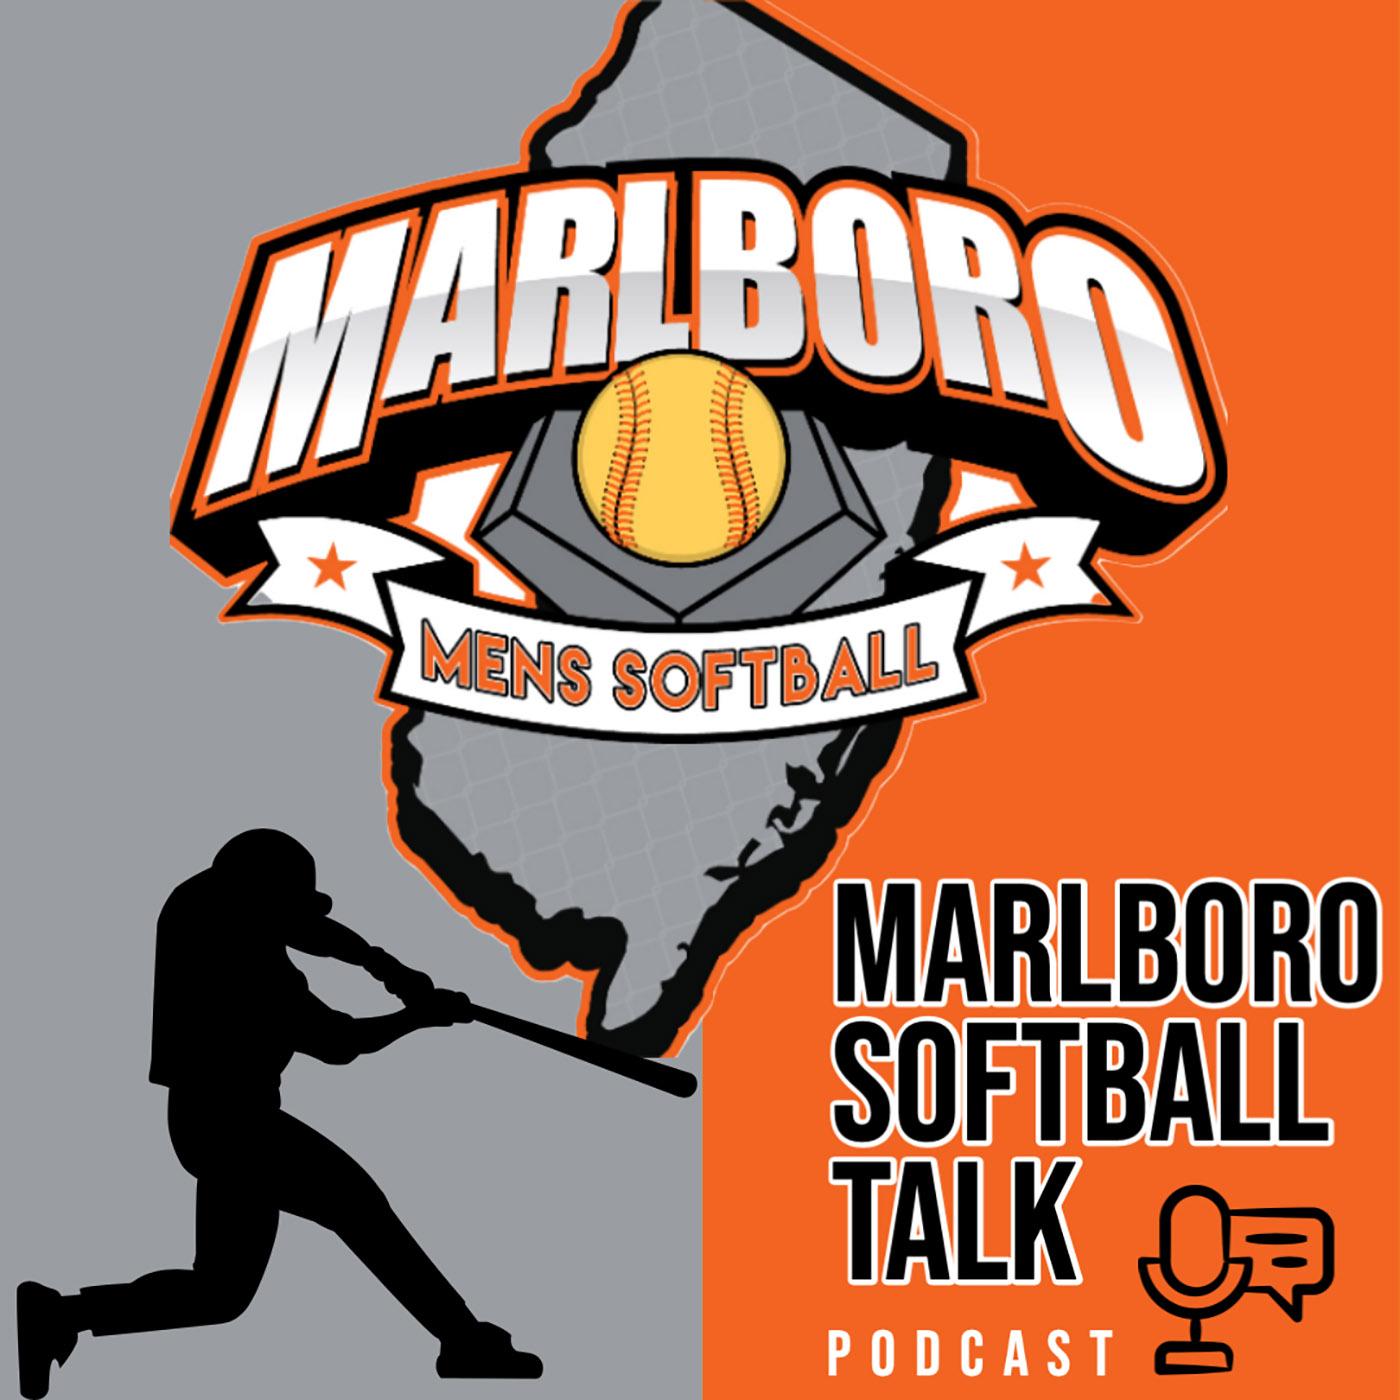 Artwork for podcast Marlboro Softball Talk